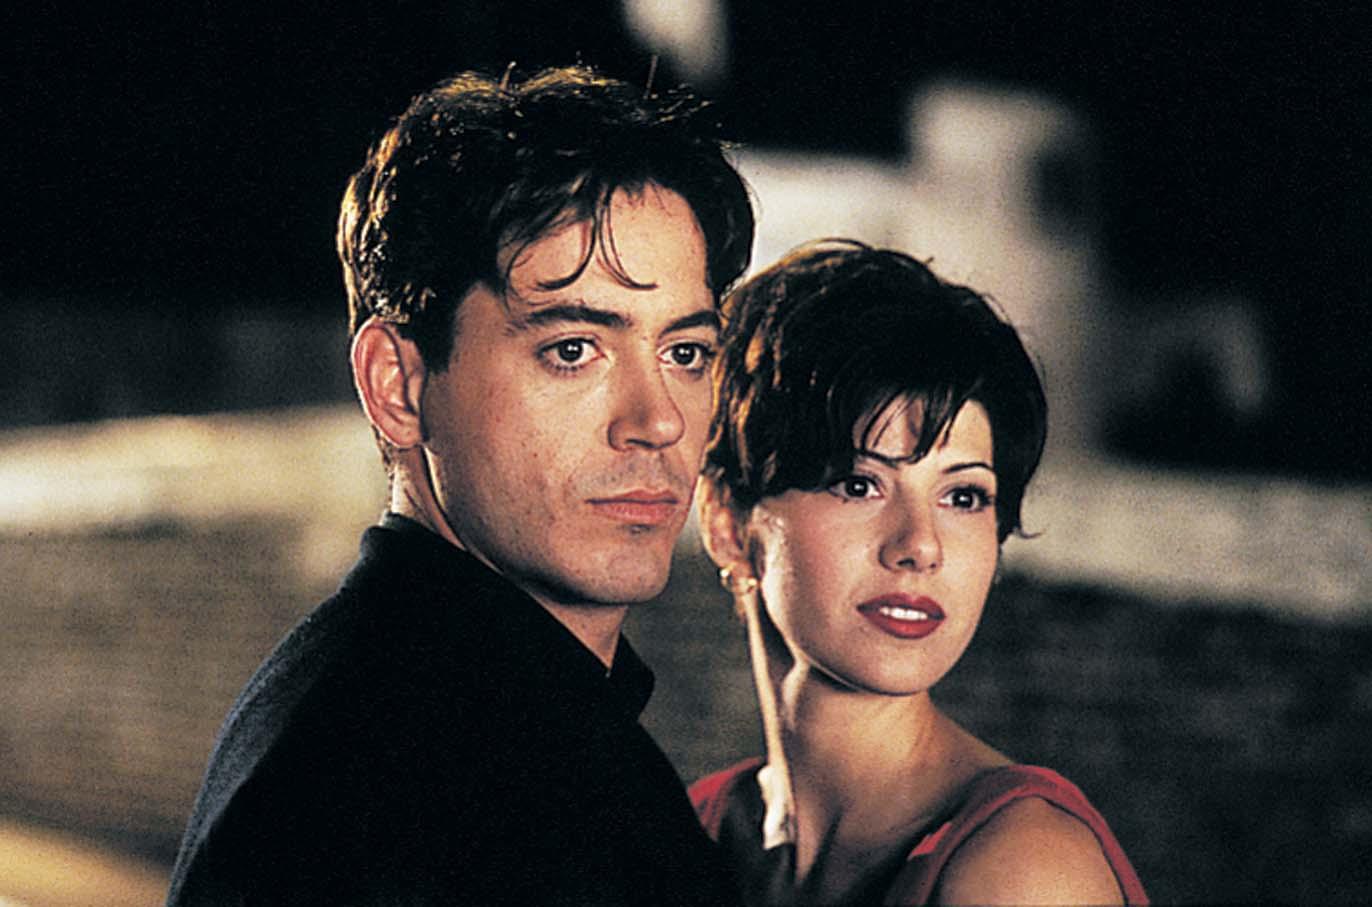 fakat unik Pacar Asli dari Iron Man - Robert Downey Jr yang terkenal sebagai pemeran Iron Man pernah menjalin kasih dengan Marisa Tomei